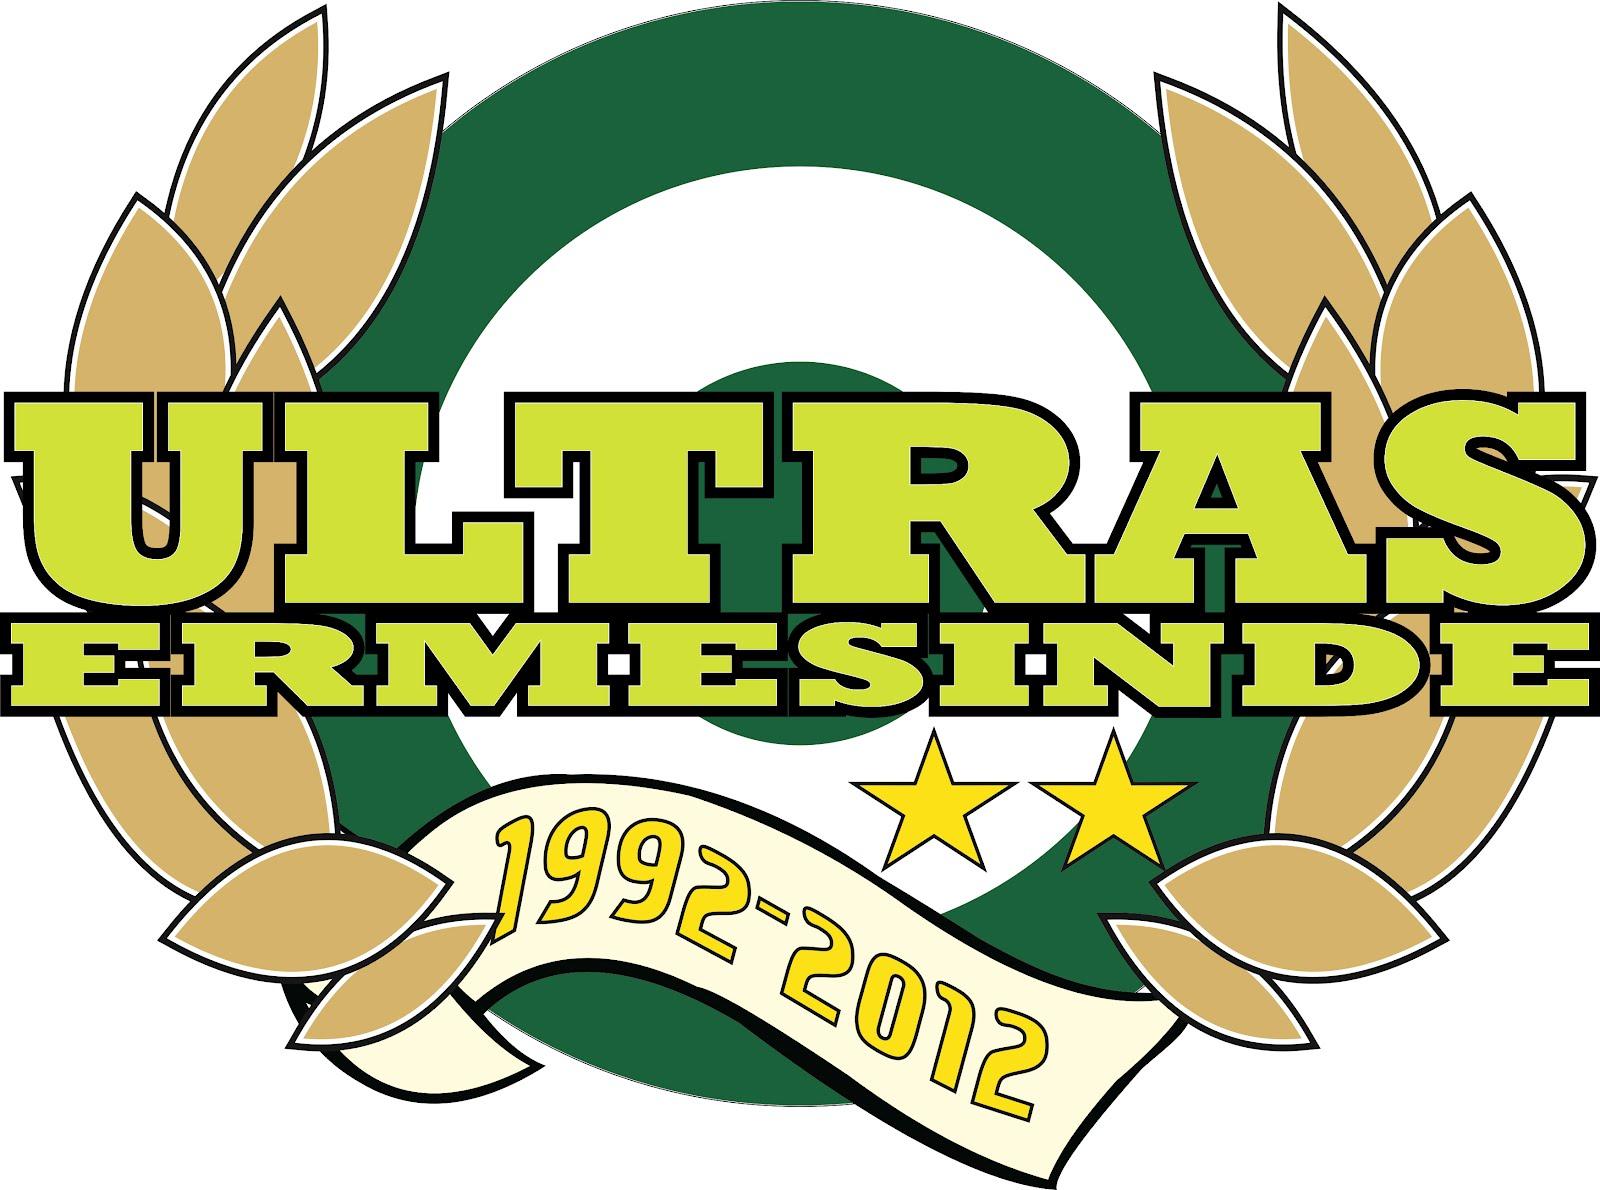 ULTRAS ERMESINDE 1992